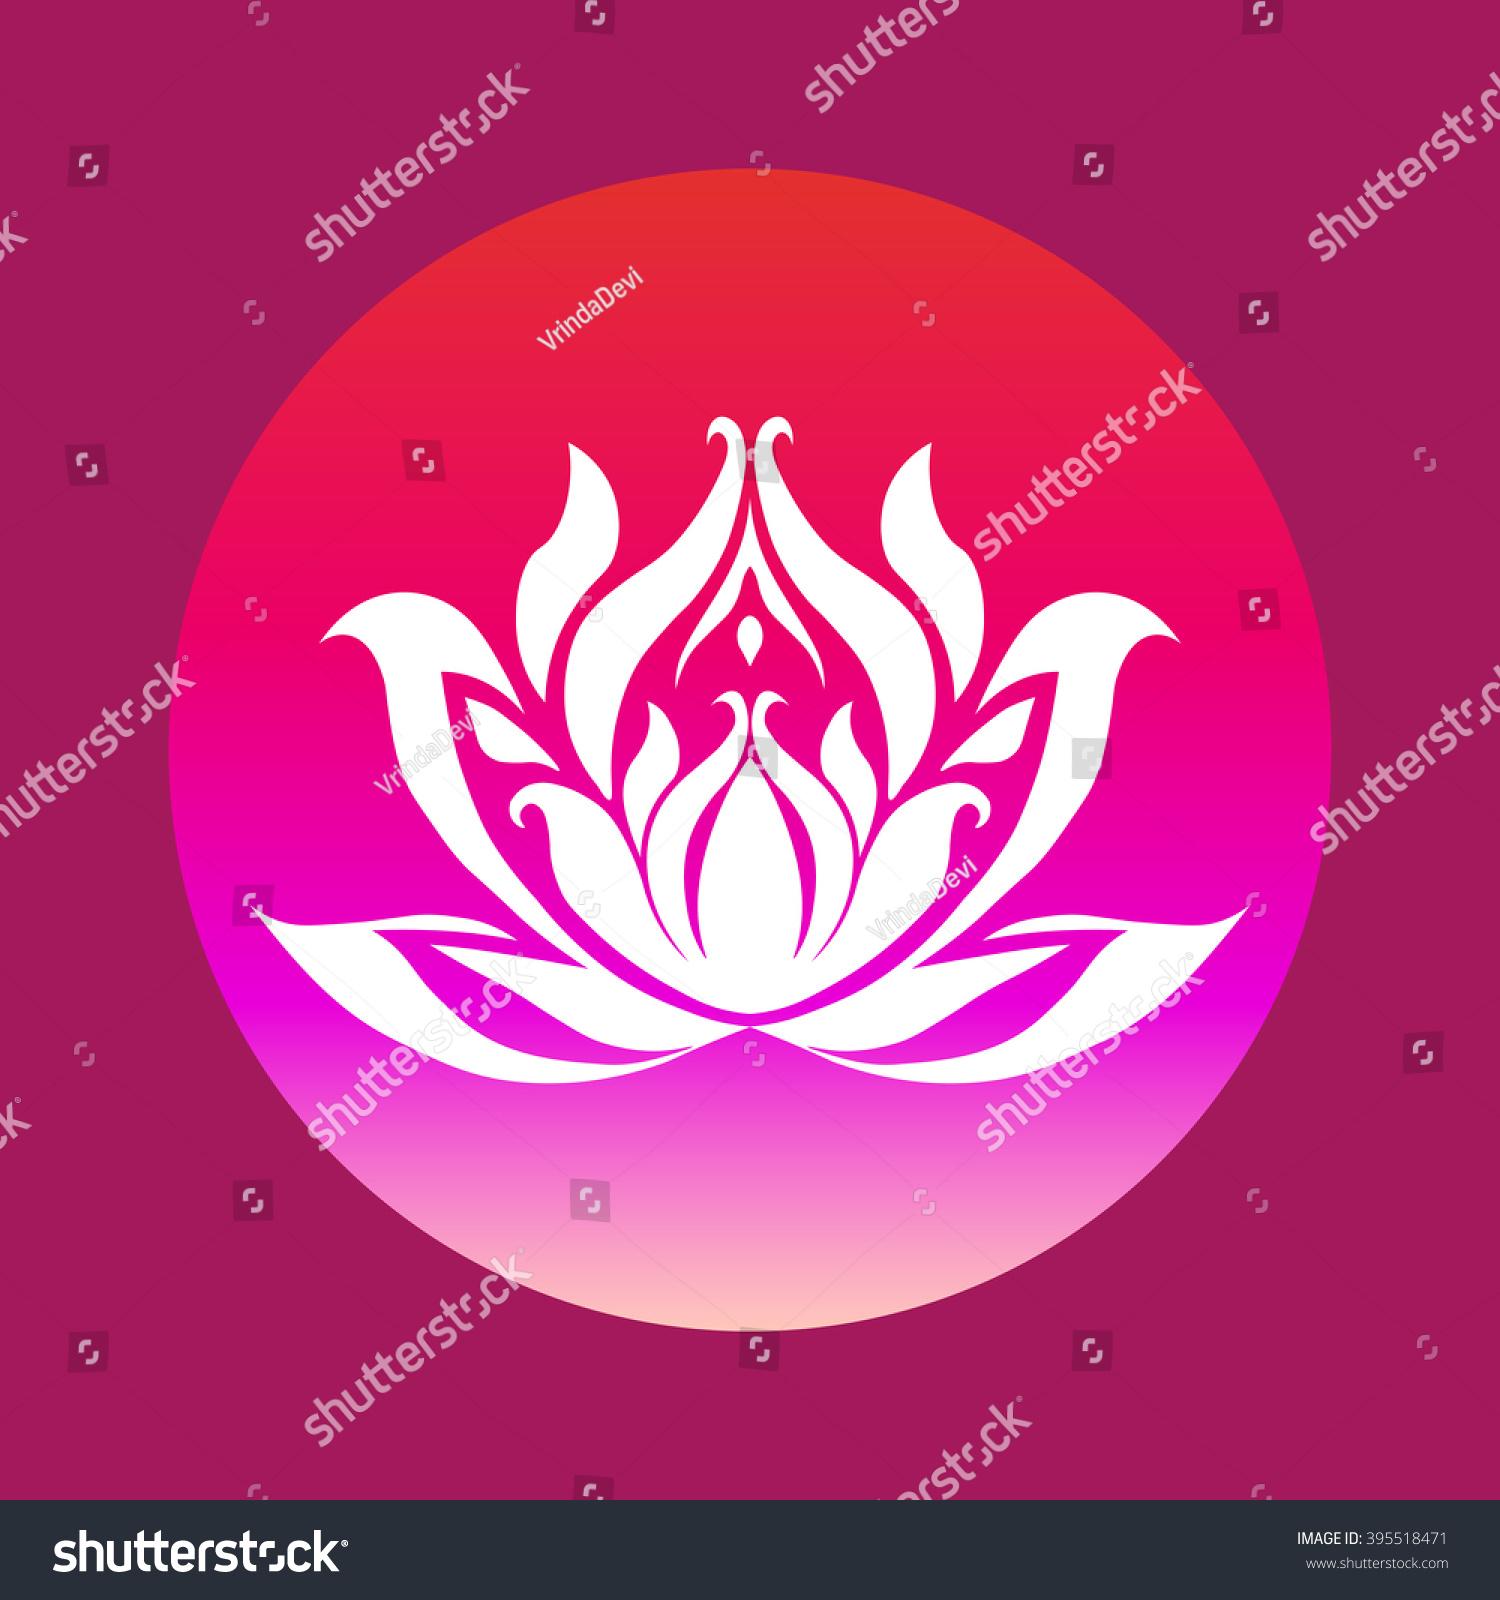 Royalty Free White Lotus Flower Silhouette Vector 395518471 Stock